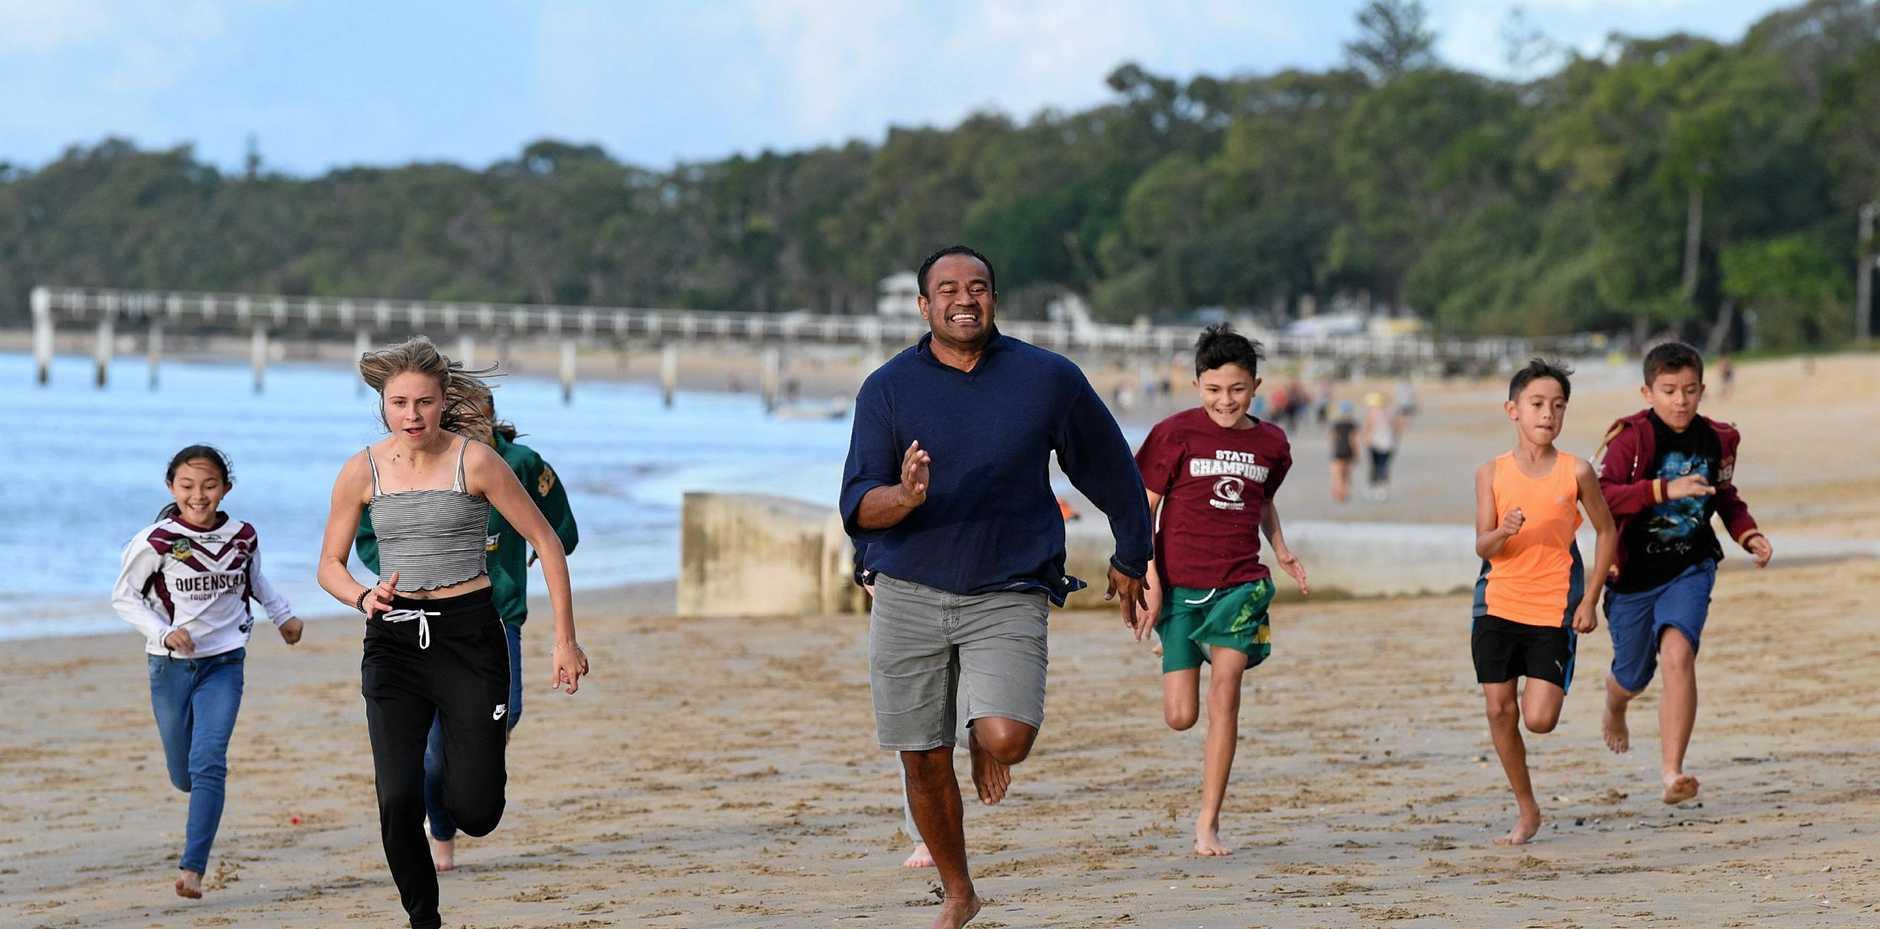 RUN: Brisbane Mustang's family beach race: